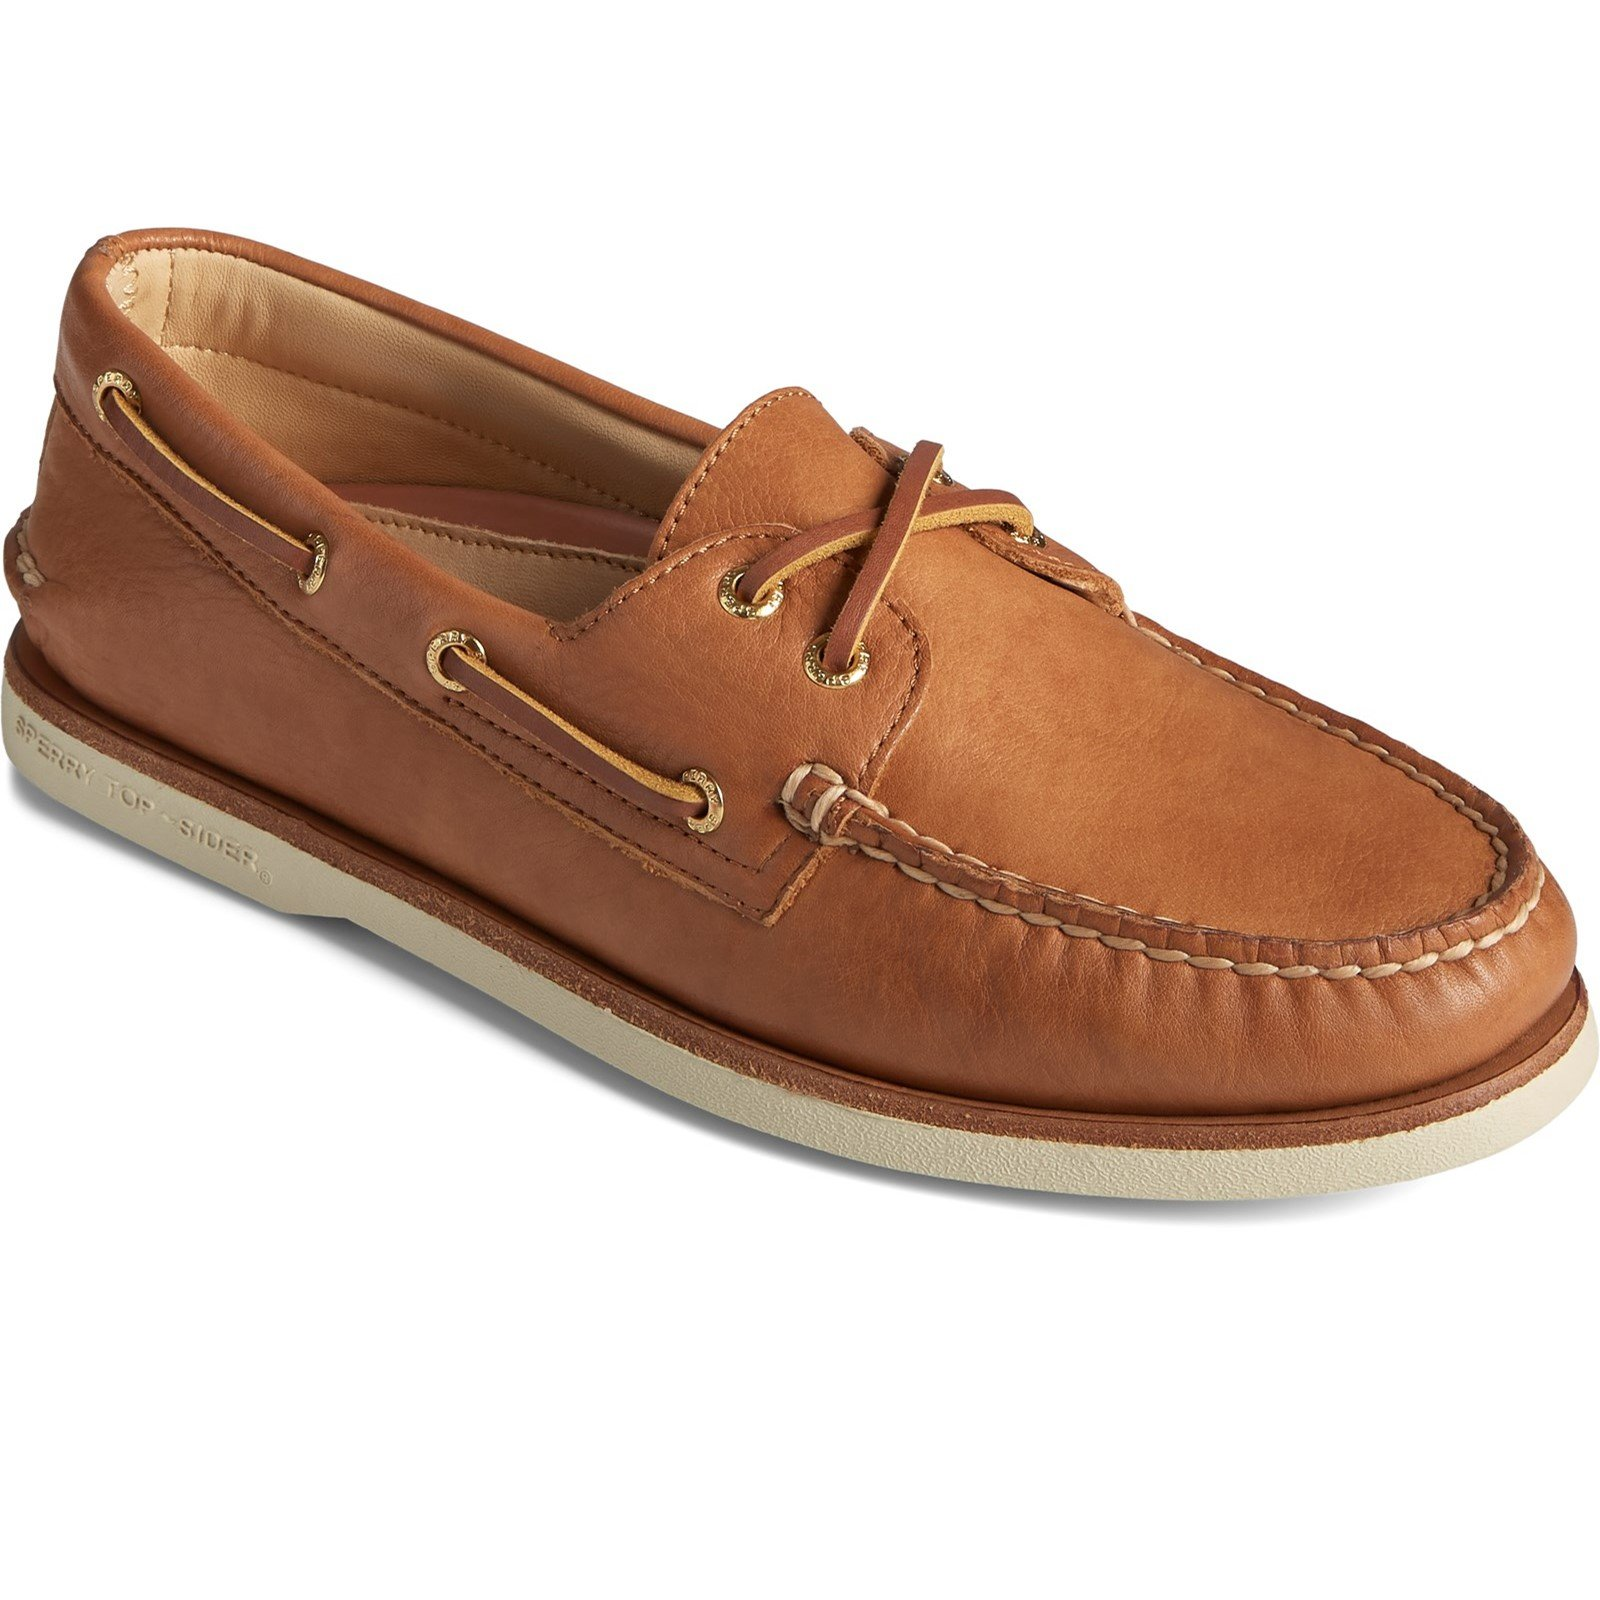 Sperry Men's A/O 2-Eye Boat Shoe Various Colours 32926 - Tan 8.5